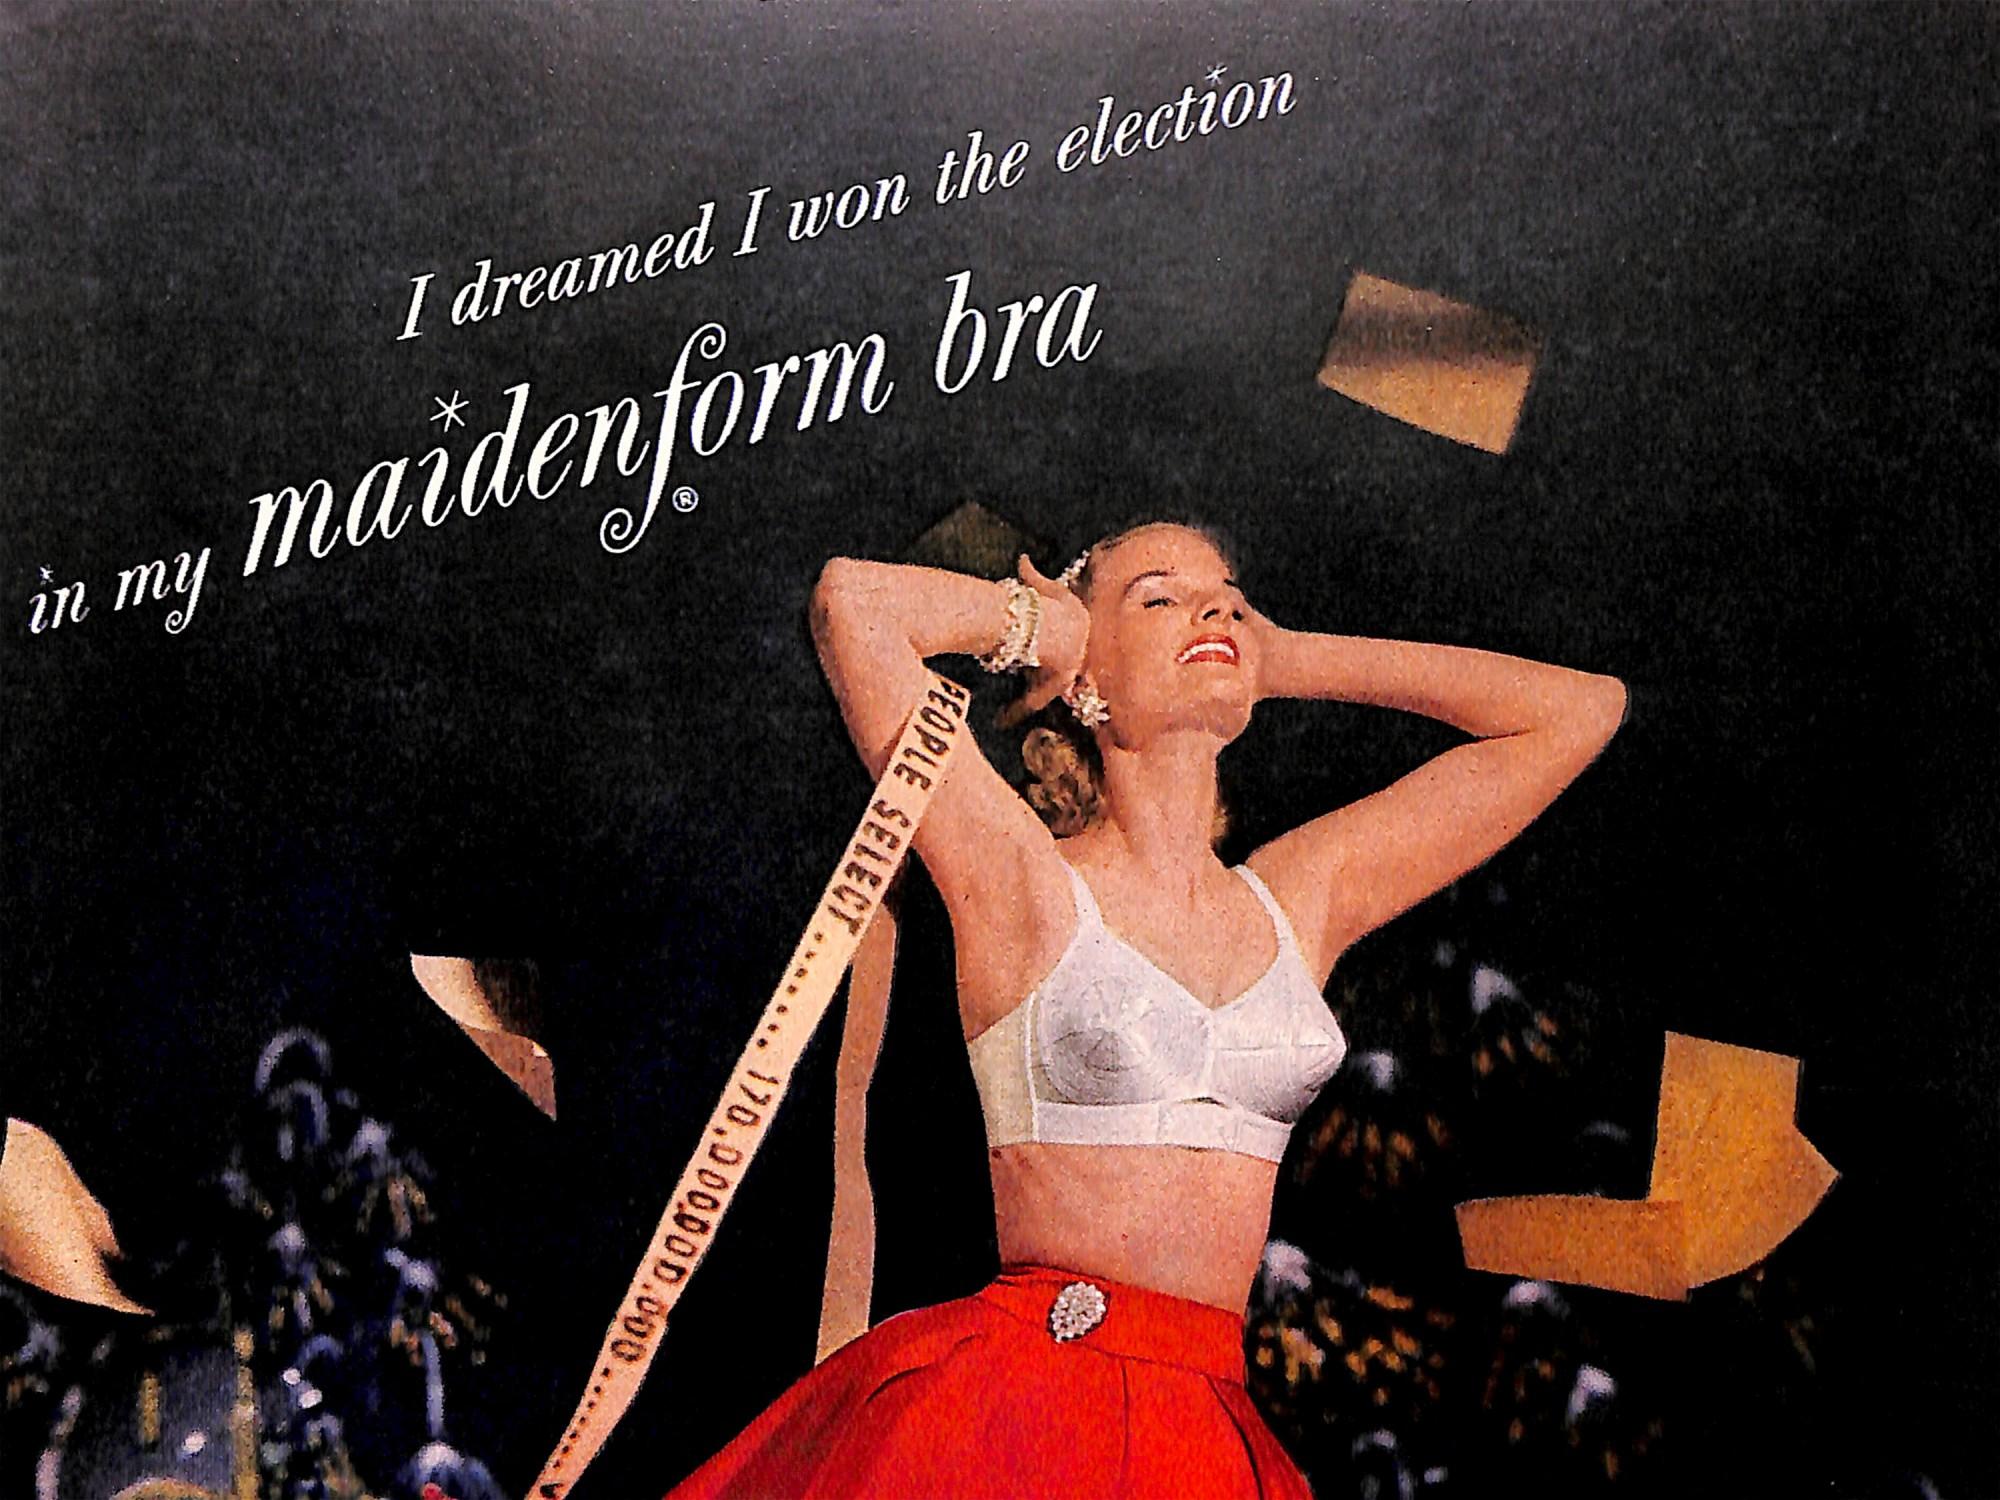 Bra Ad with the caption - I dreamed I won the election.